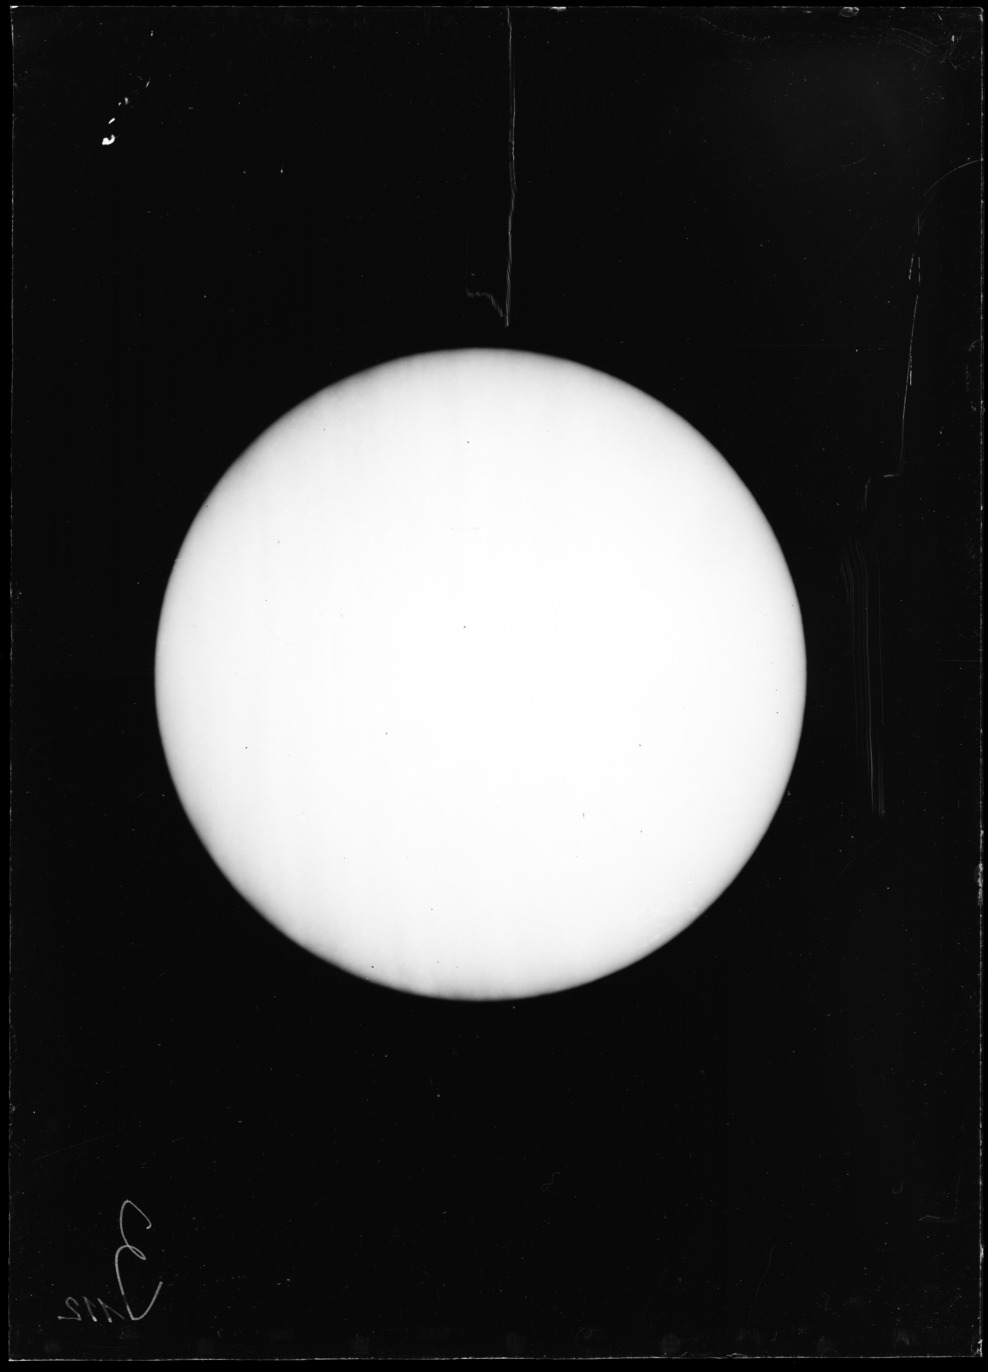 AGlV112